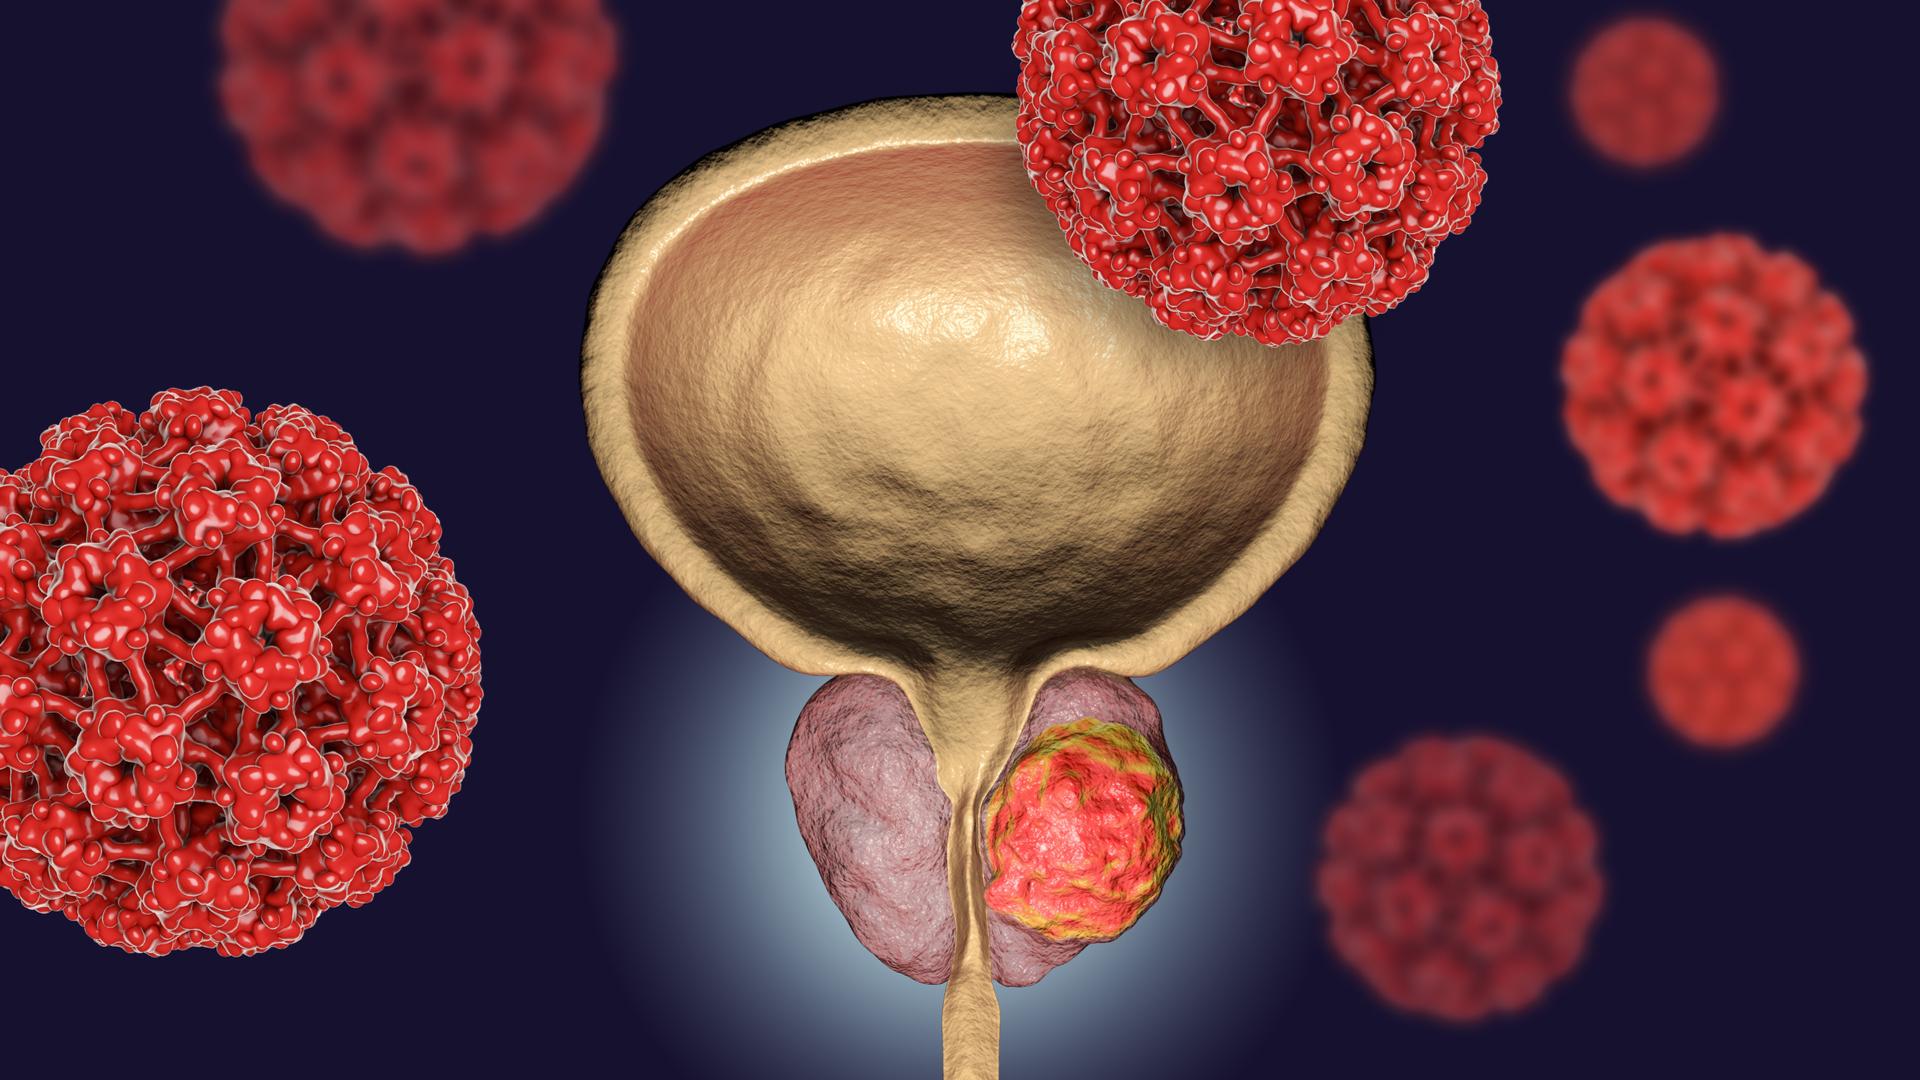 detectar el cancer de prostata